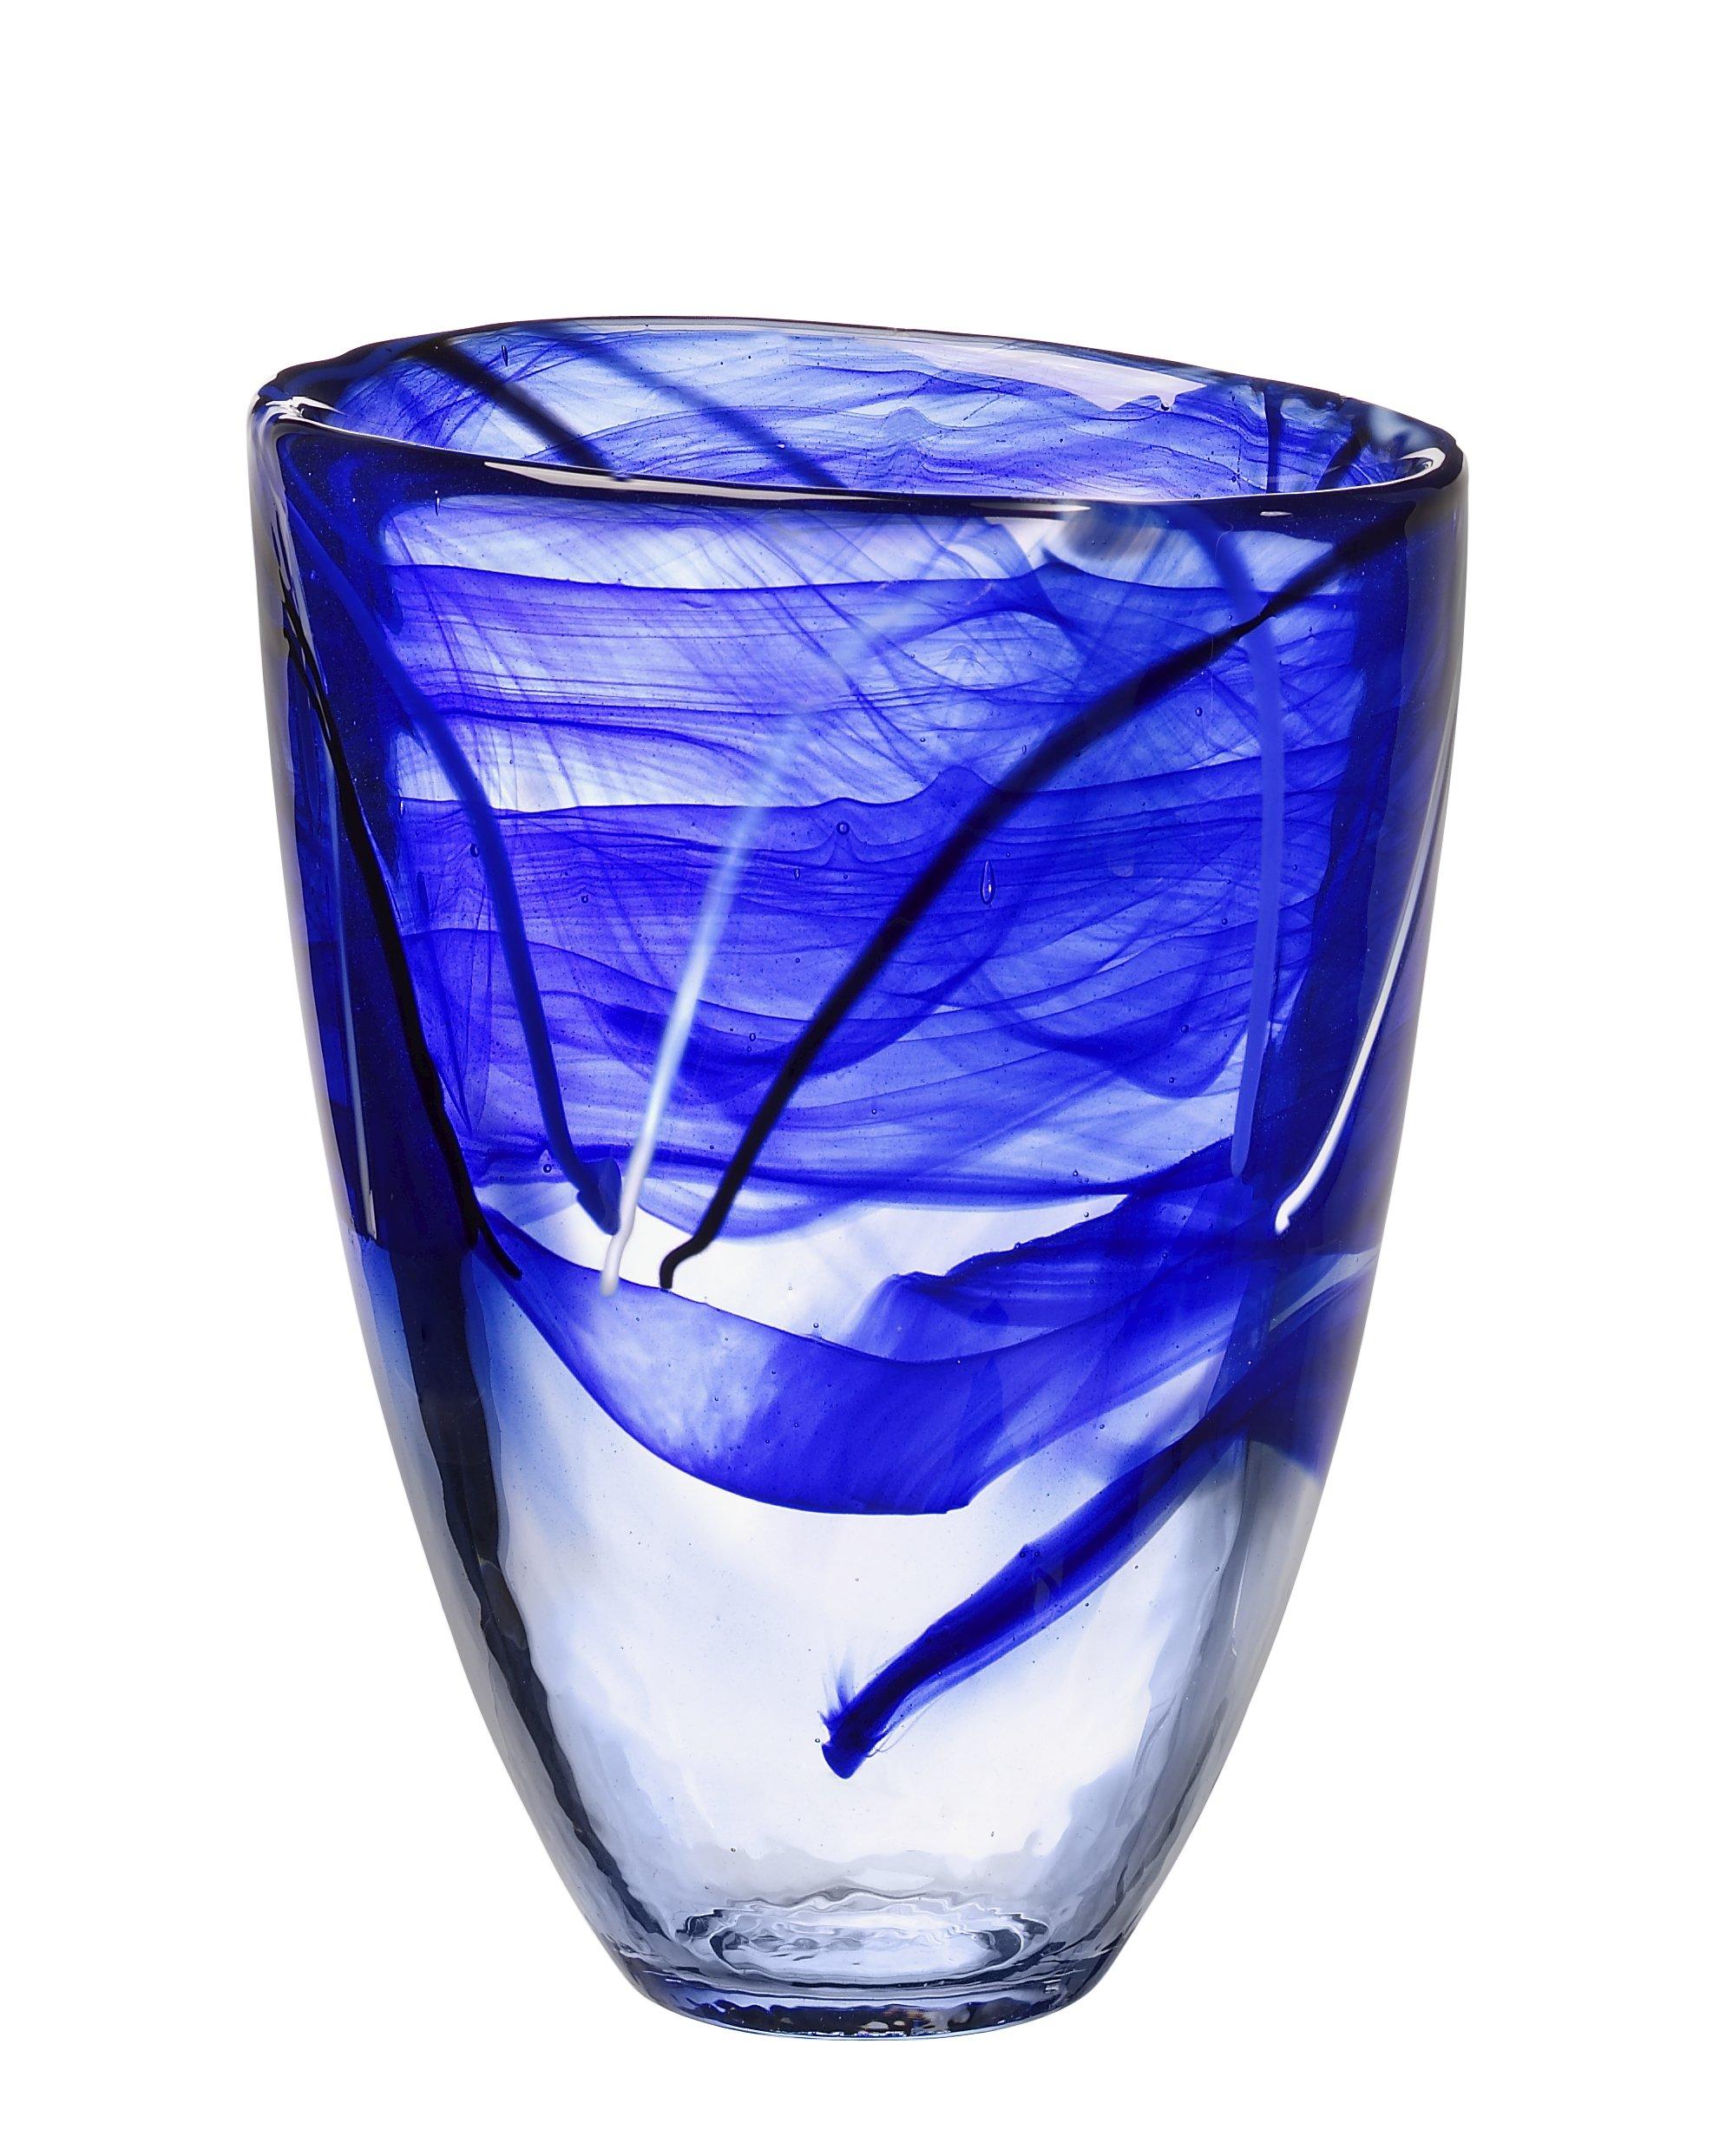 Kosta Boda Contrast Vase, Blue by Kosta Boda